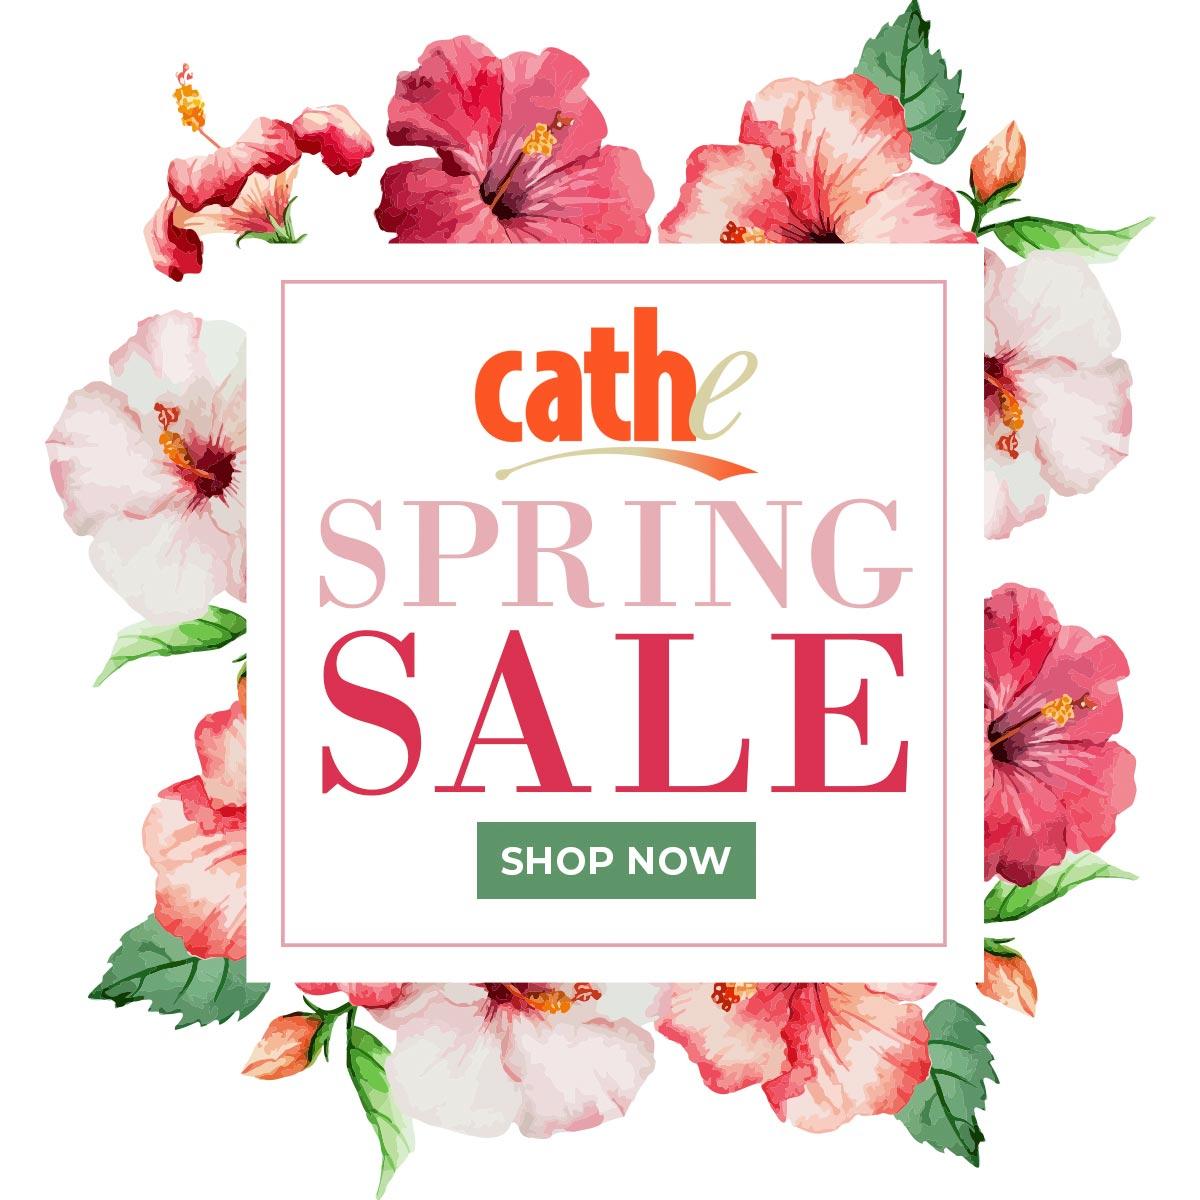 Cathe Spring Sale Now Through 3 26 18 Cathe Friedrich